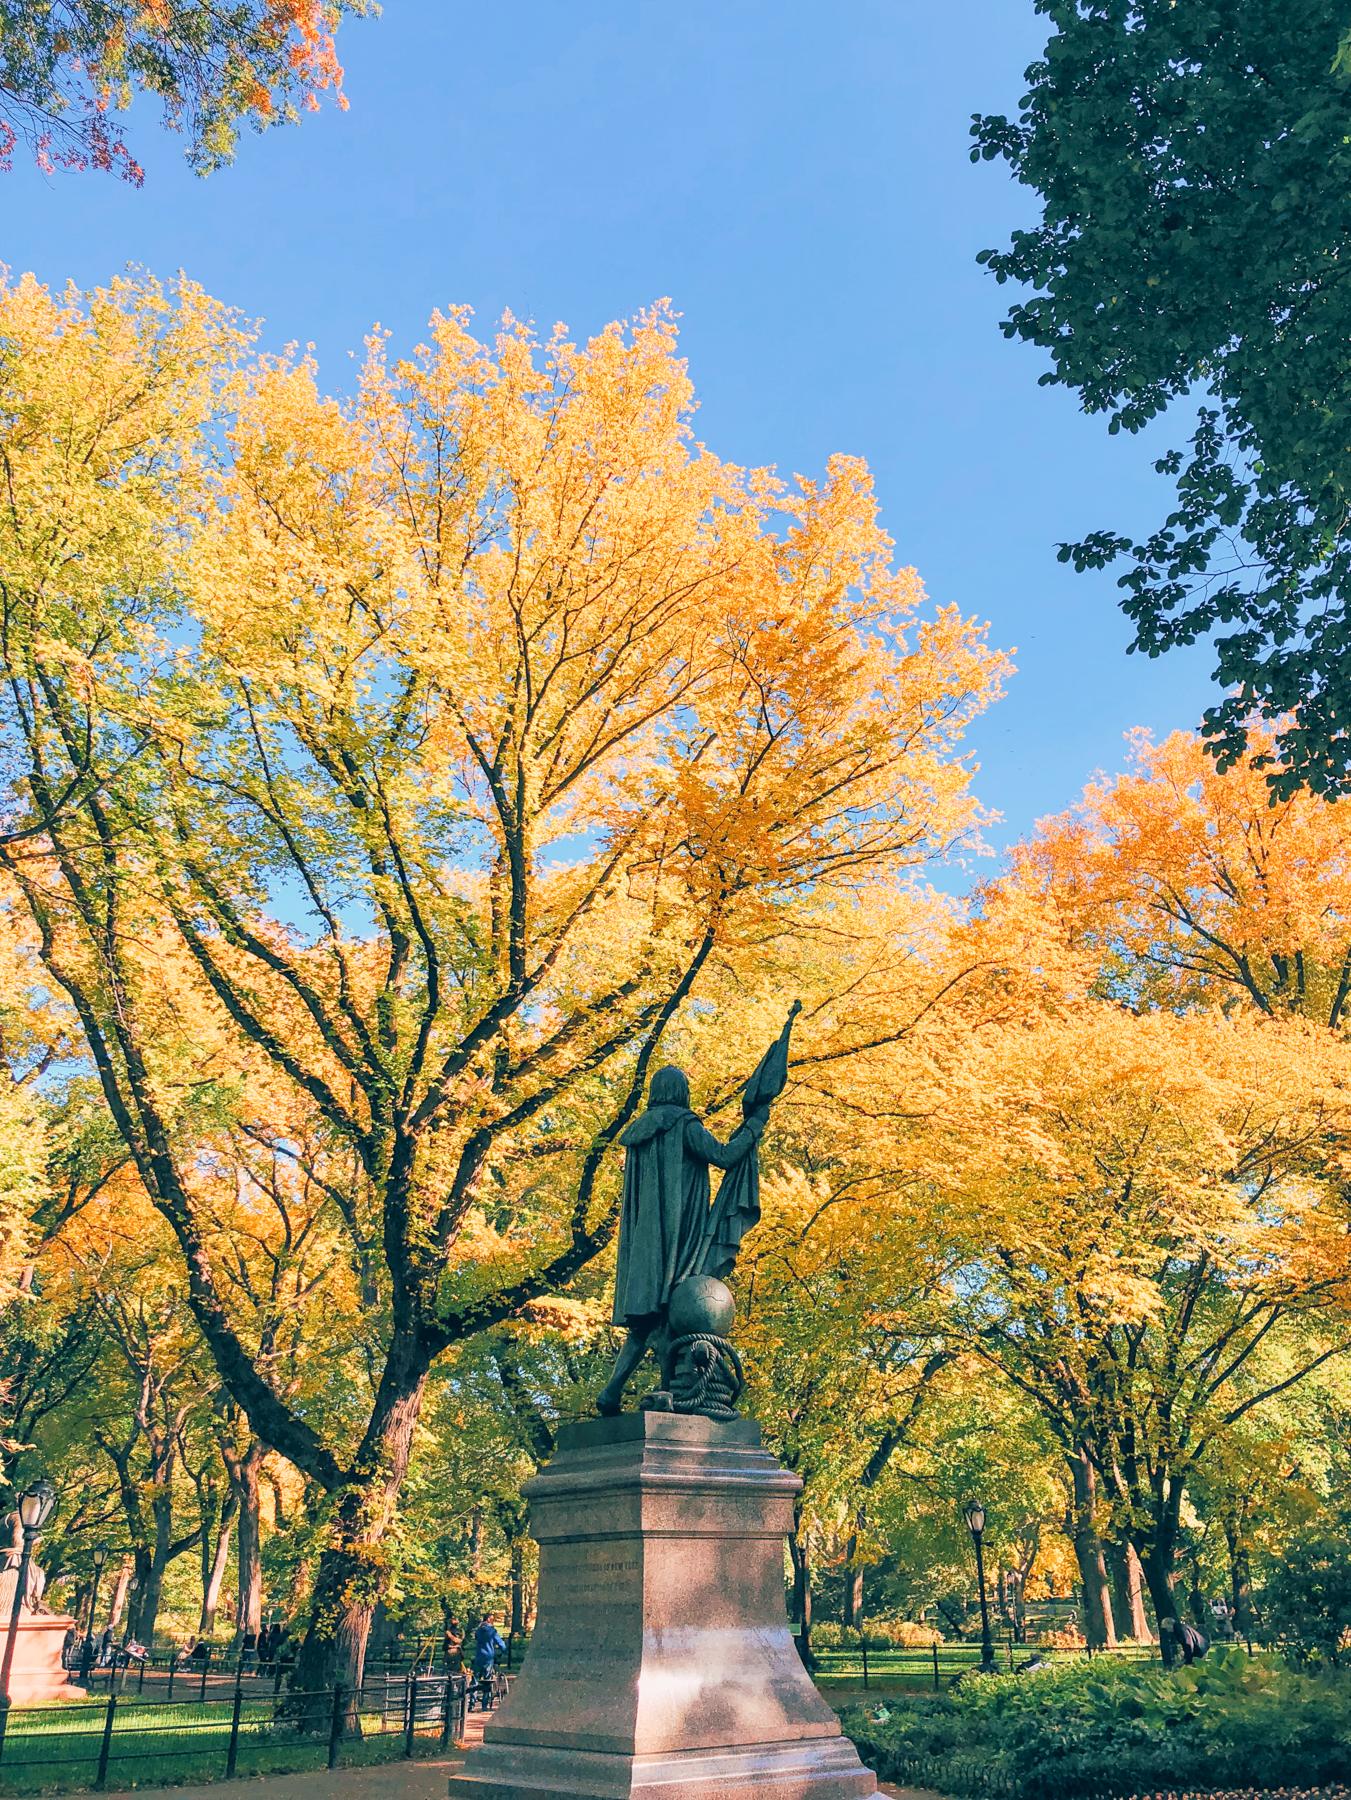 Central Park, Christopher Columbus Statue